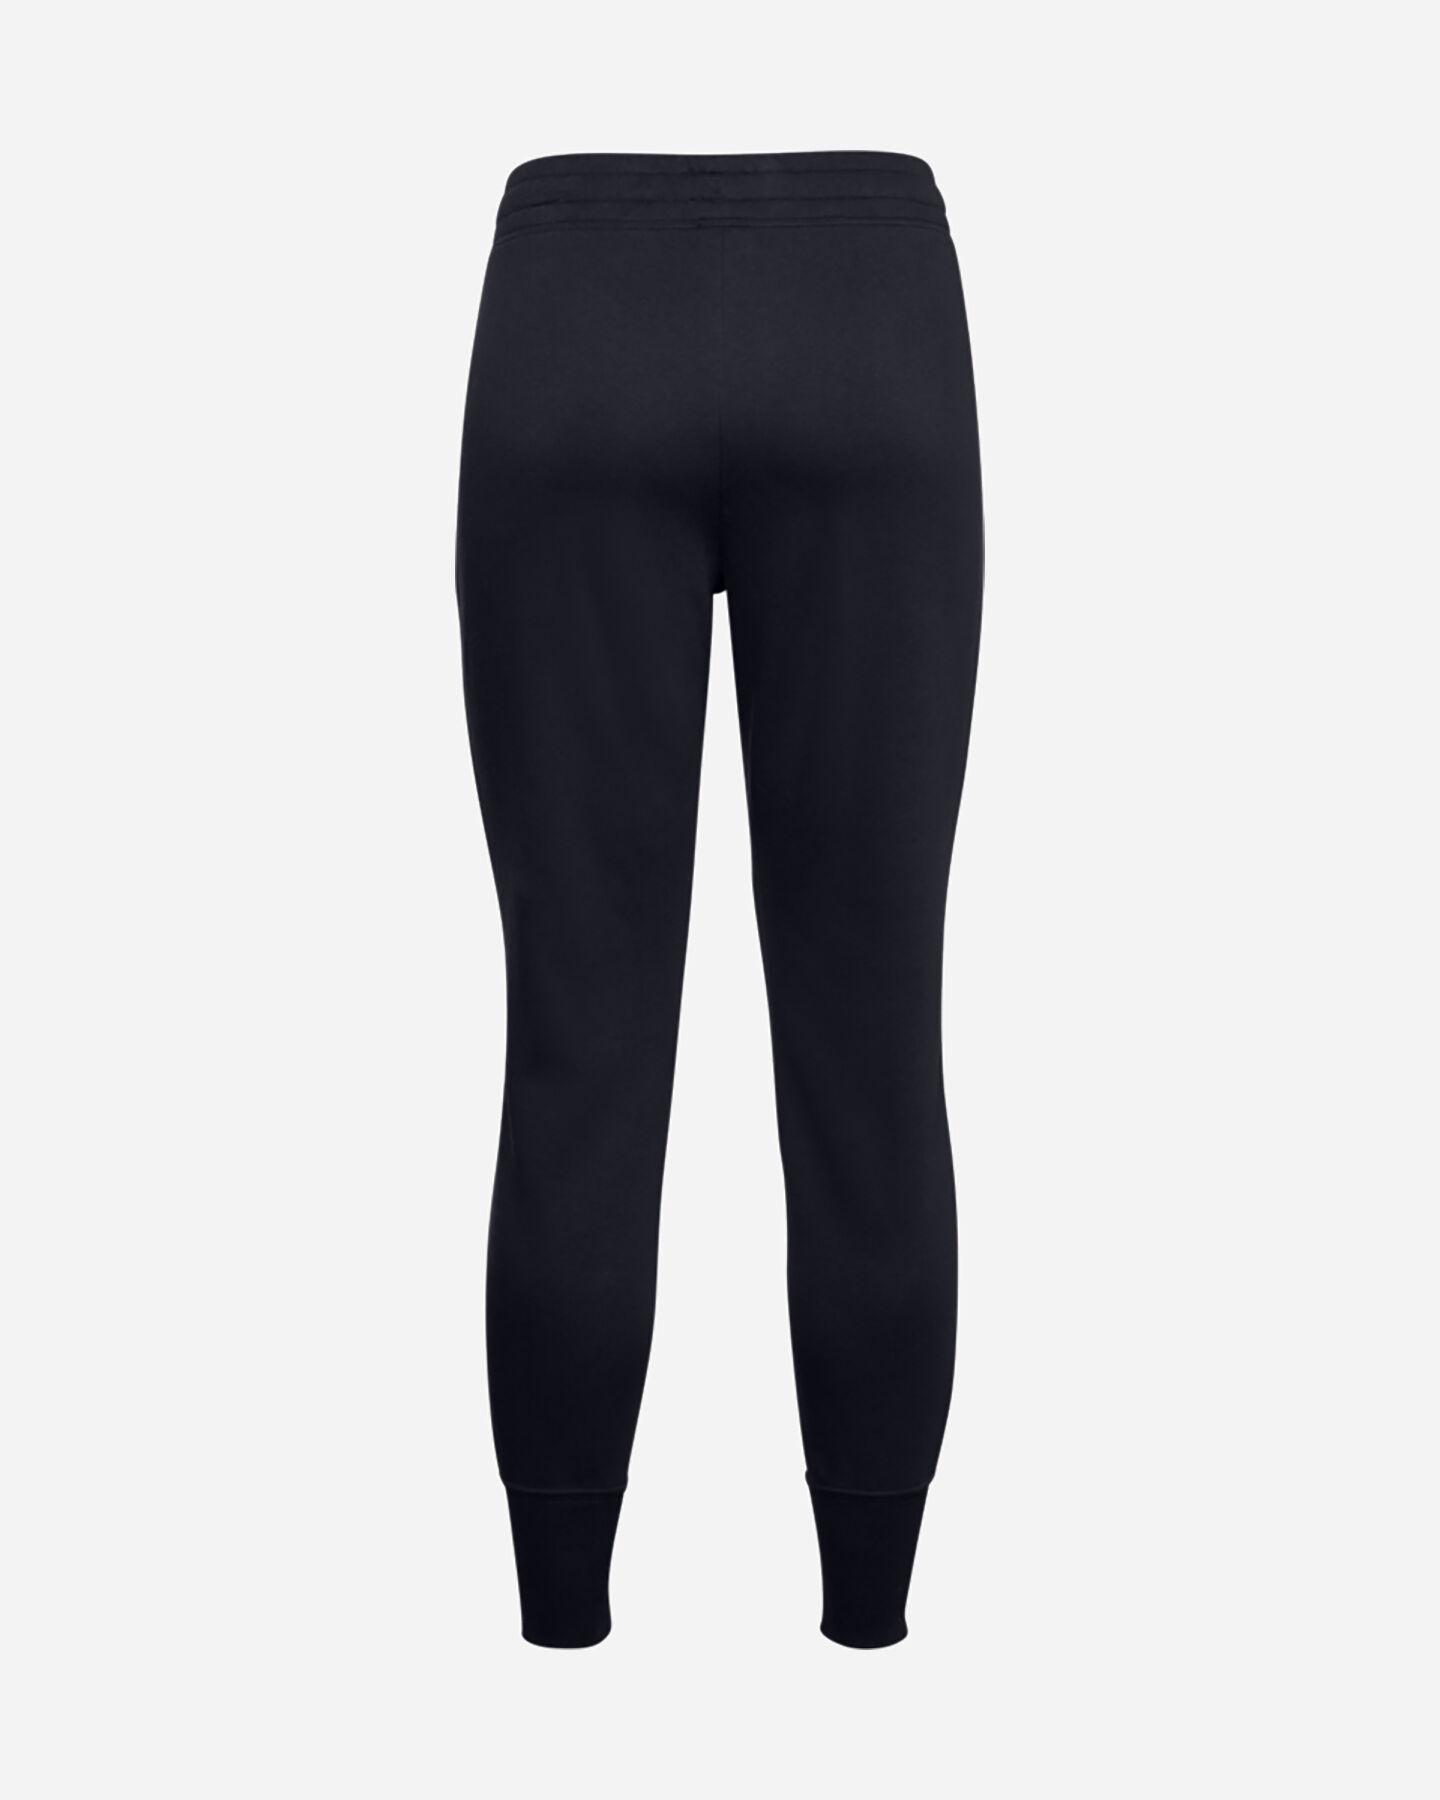 Pantalone UNDER ARMOUR RIVAL FLEECE W S5229266 scatto 1